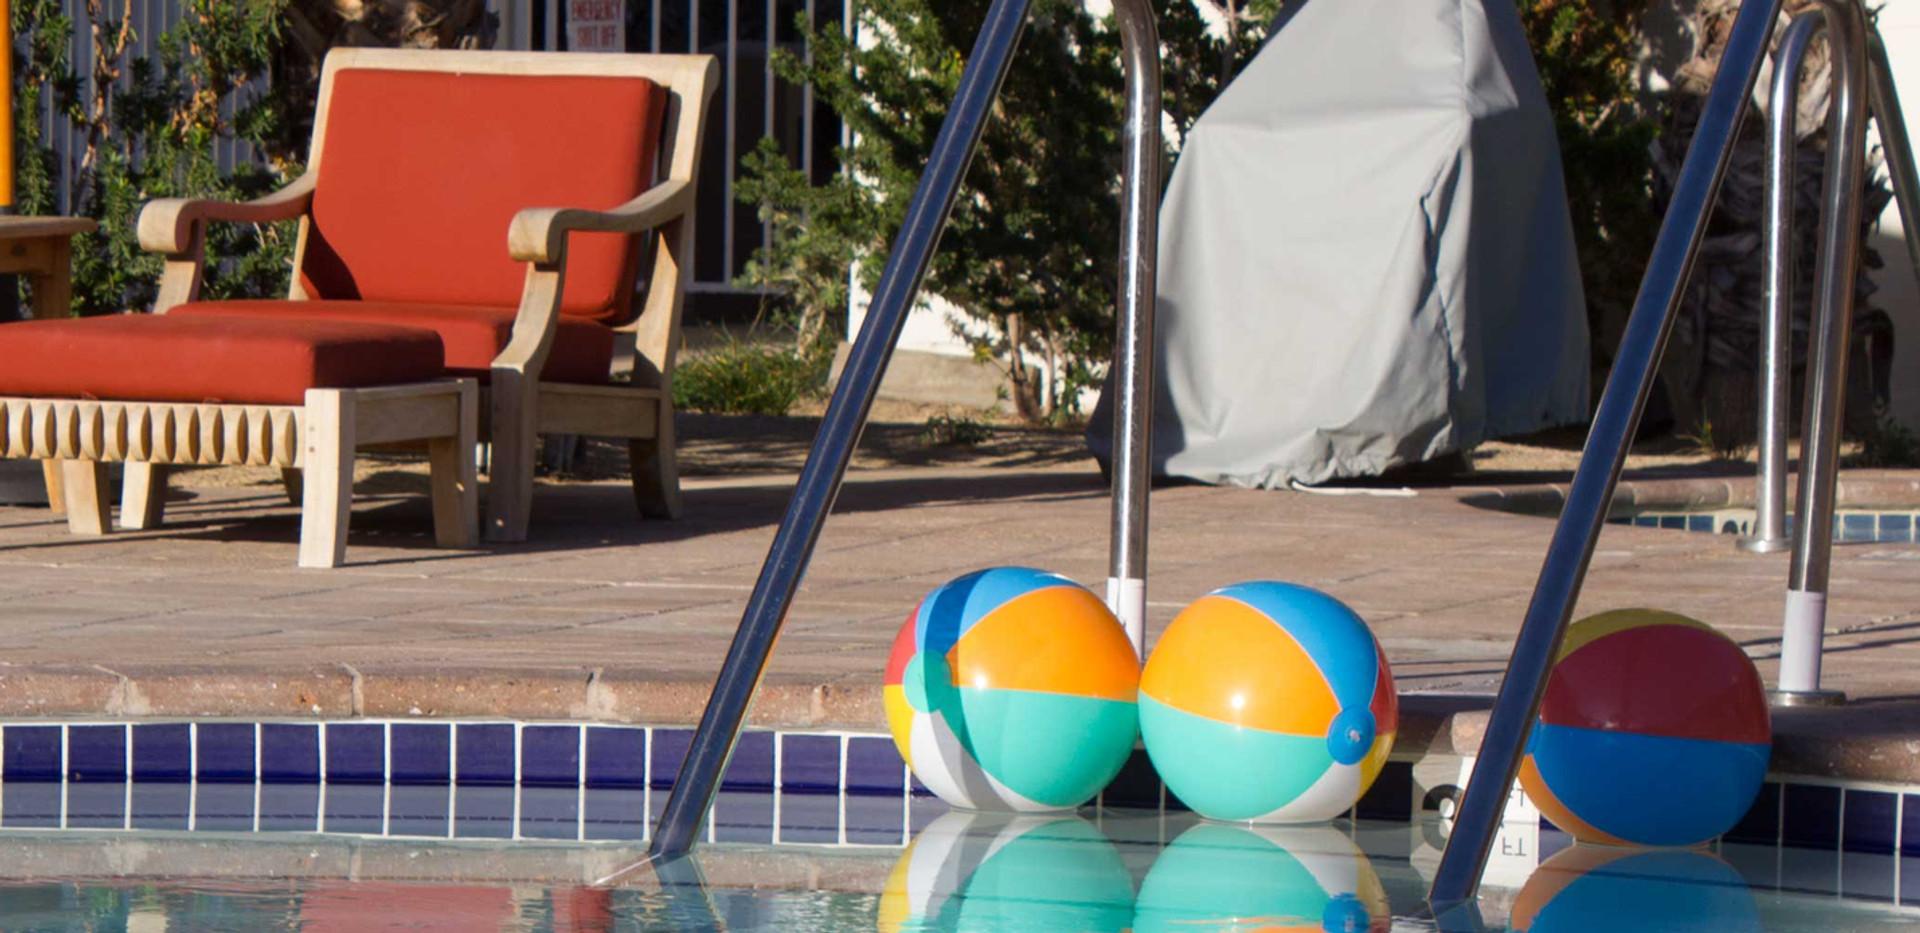 Deluxe pool with beachballs